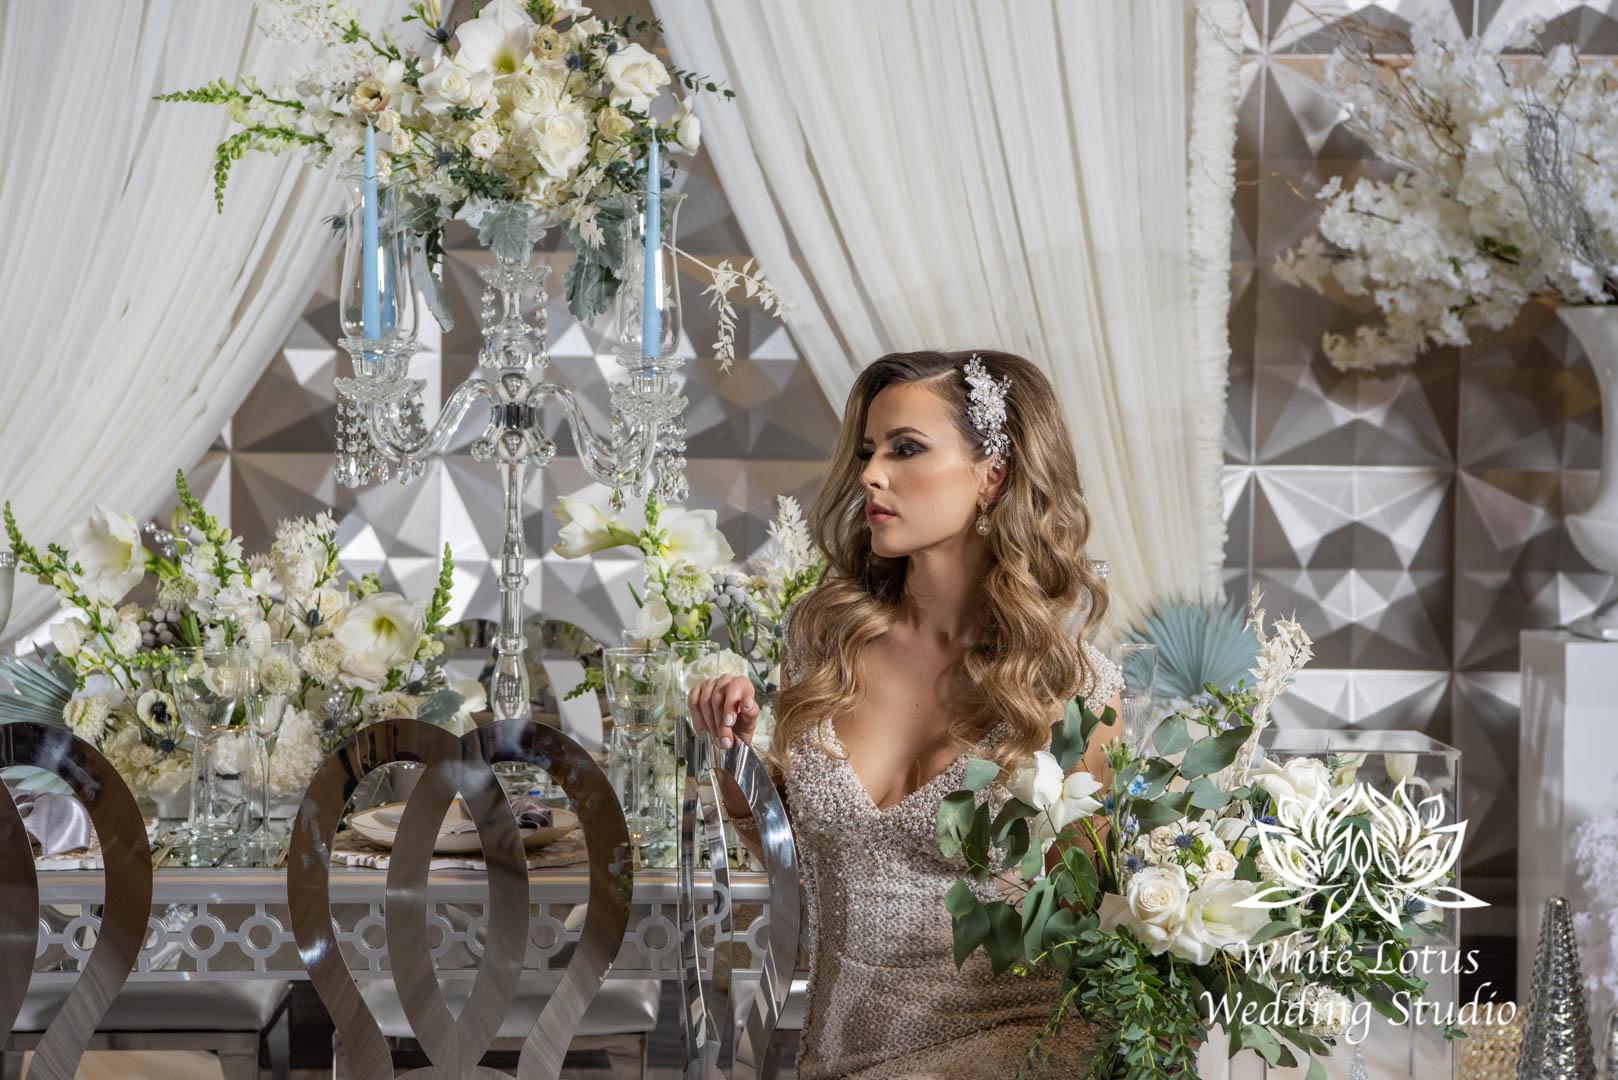 146- GLAM WINTERLUXE WEDDING INSPIRATION